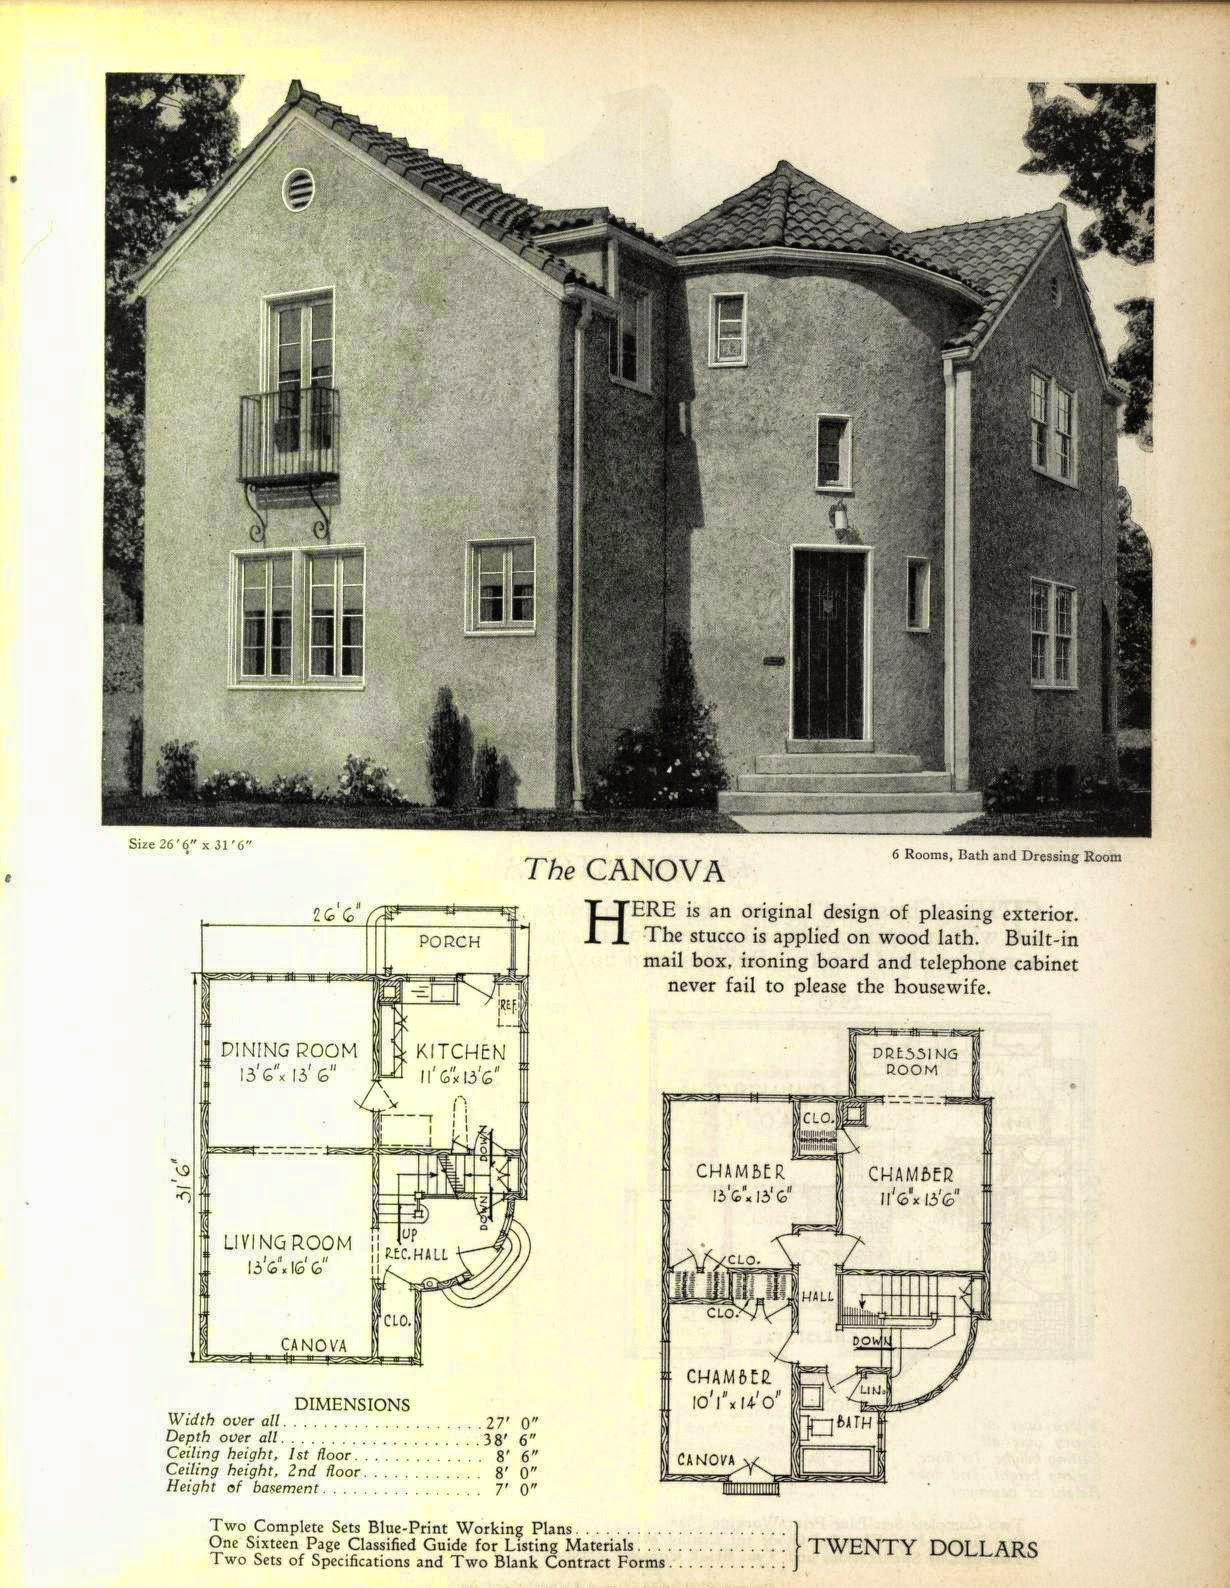 Art deco house plans Home design